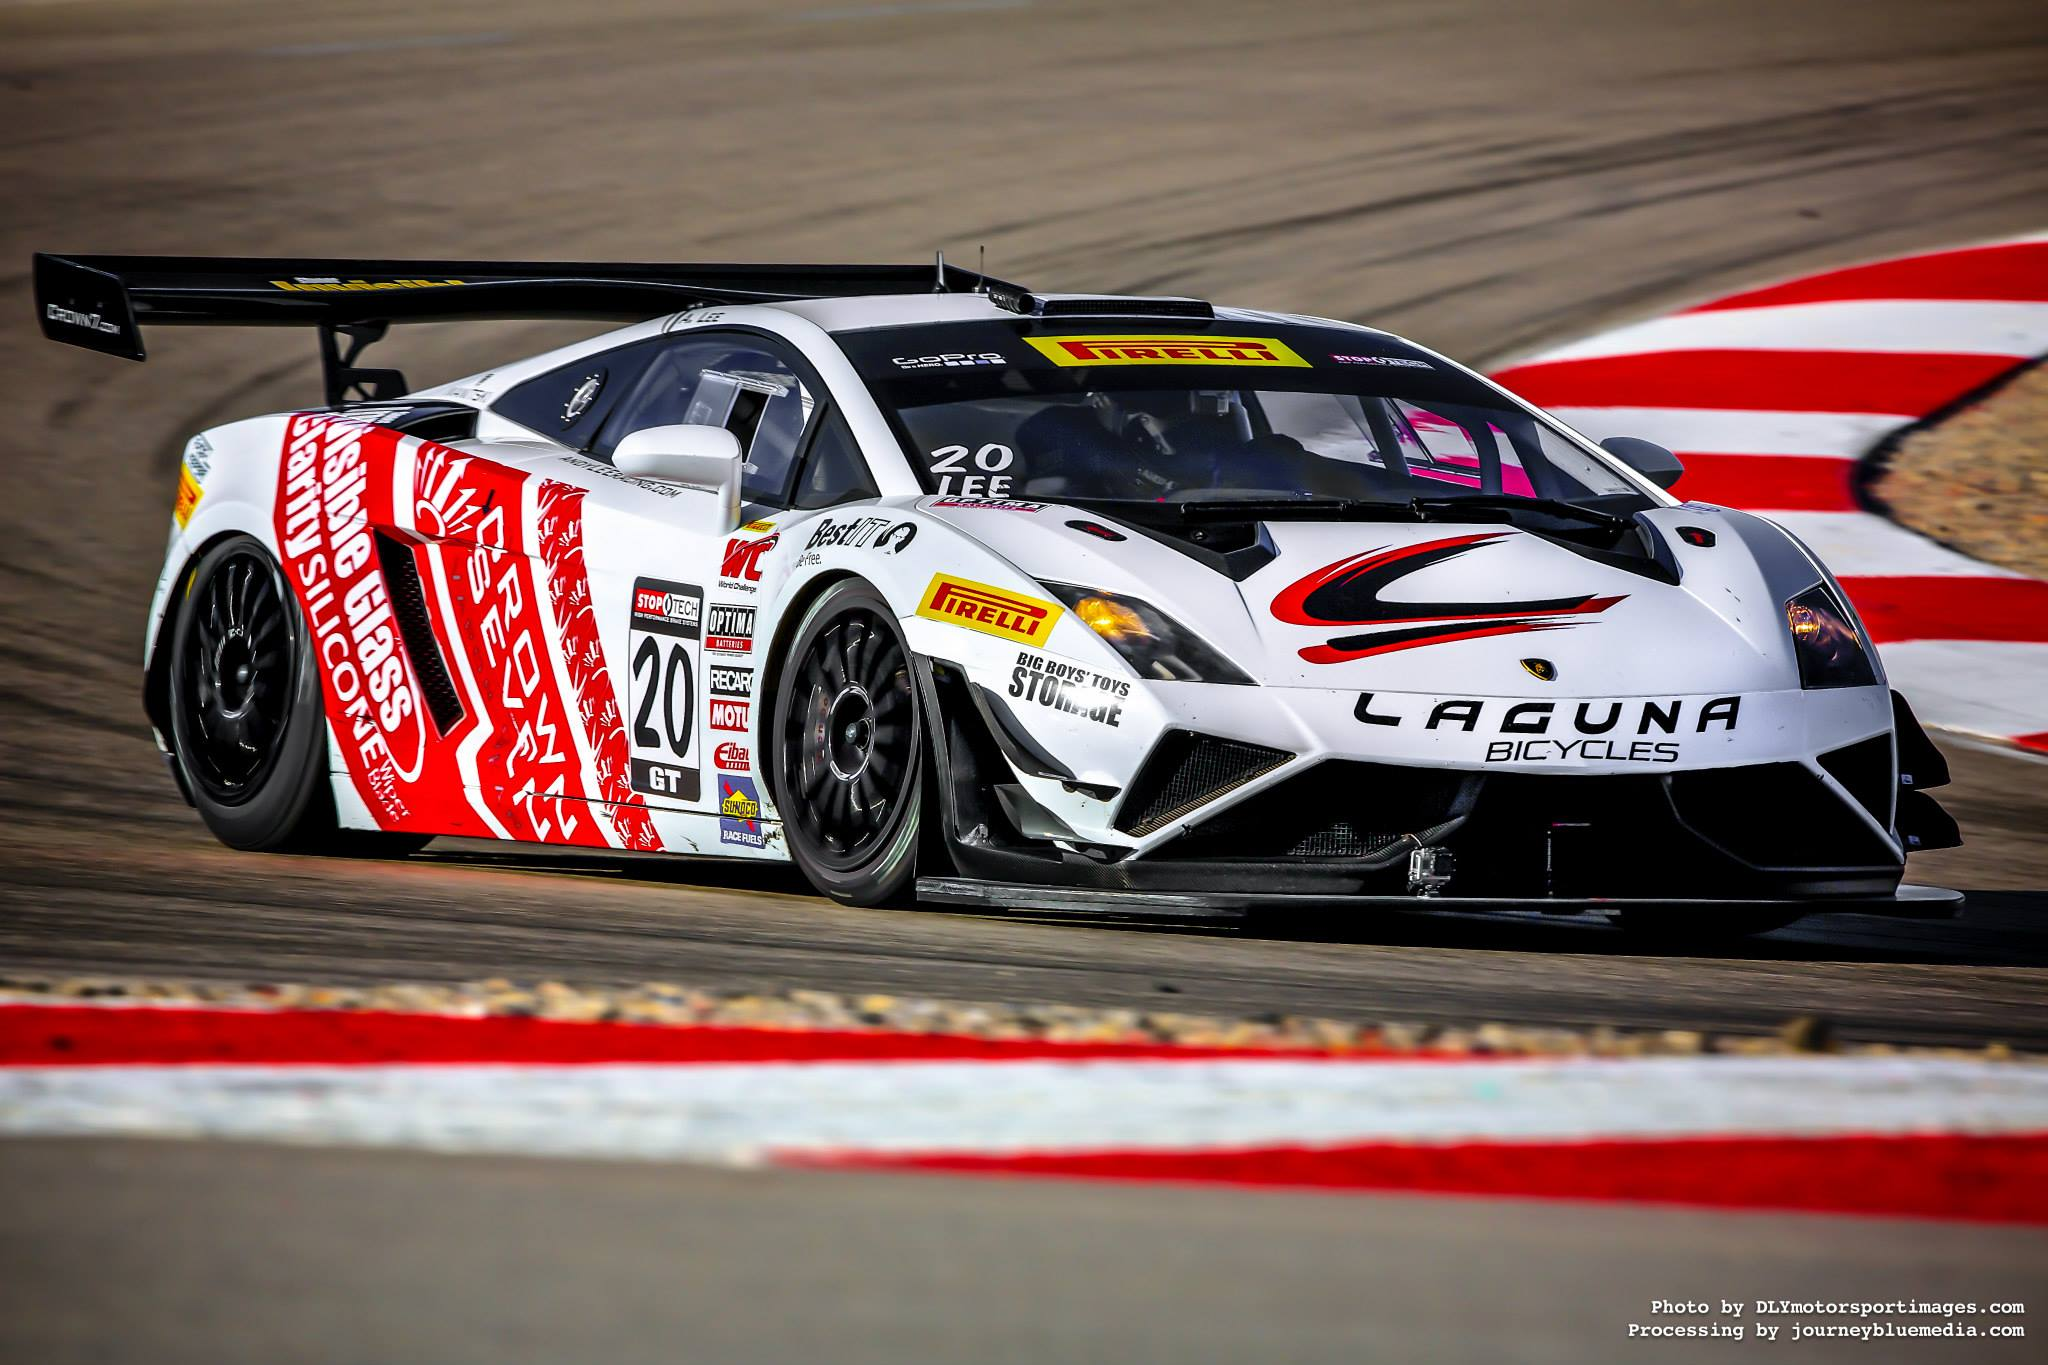 Pirelli World-Challenge GT - Experience testing/racing Cadillac, Porsche, Lamborghini, and Acura GT3 models